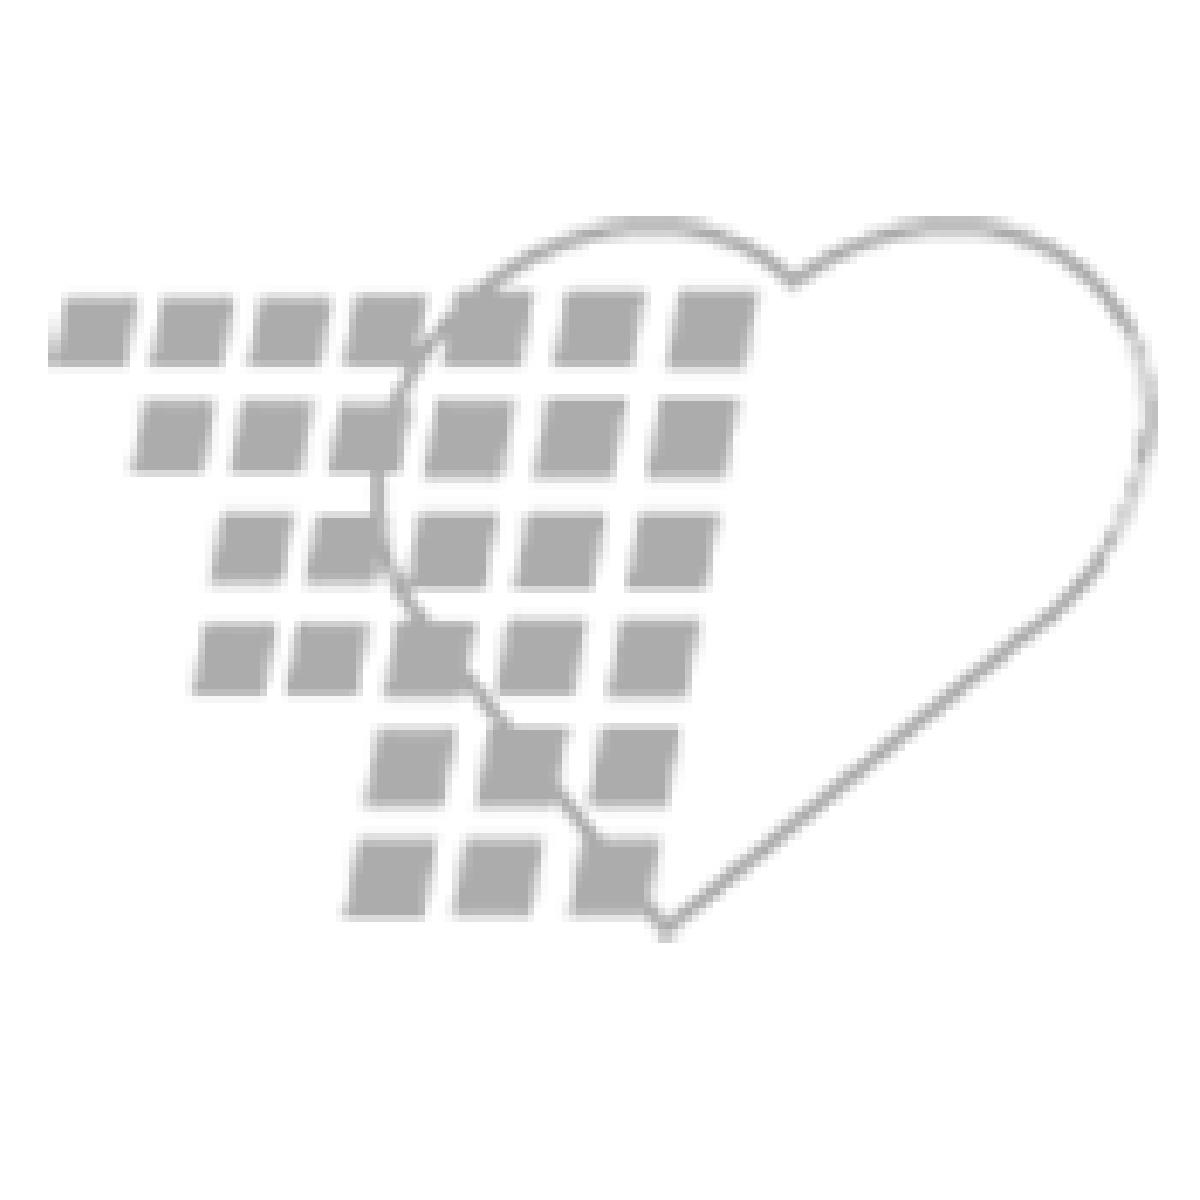 06-93-6106 - Demo Dose® Simulated FFP B Rh Positive